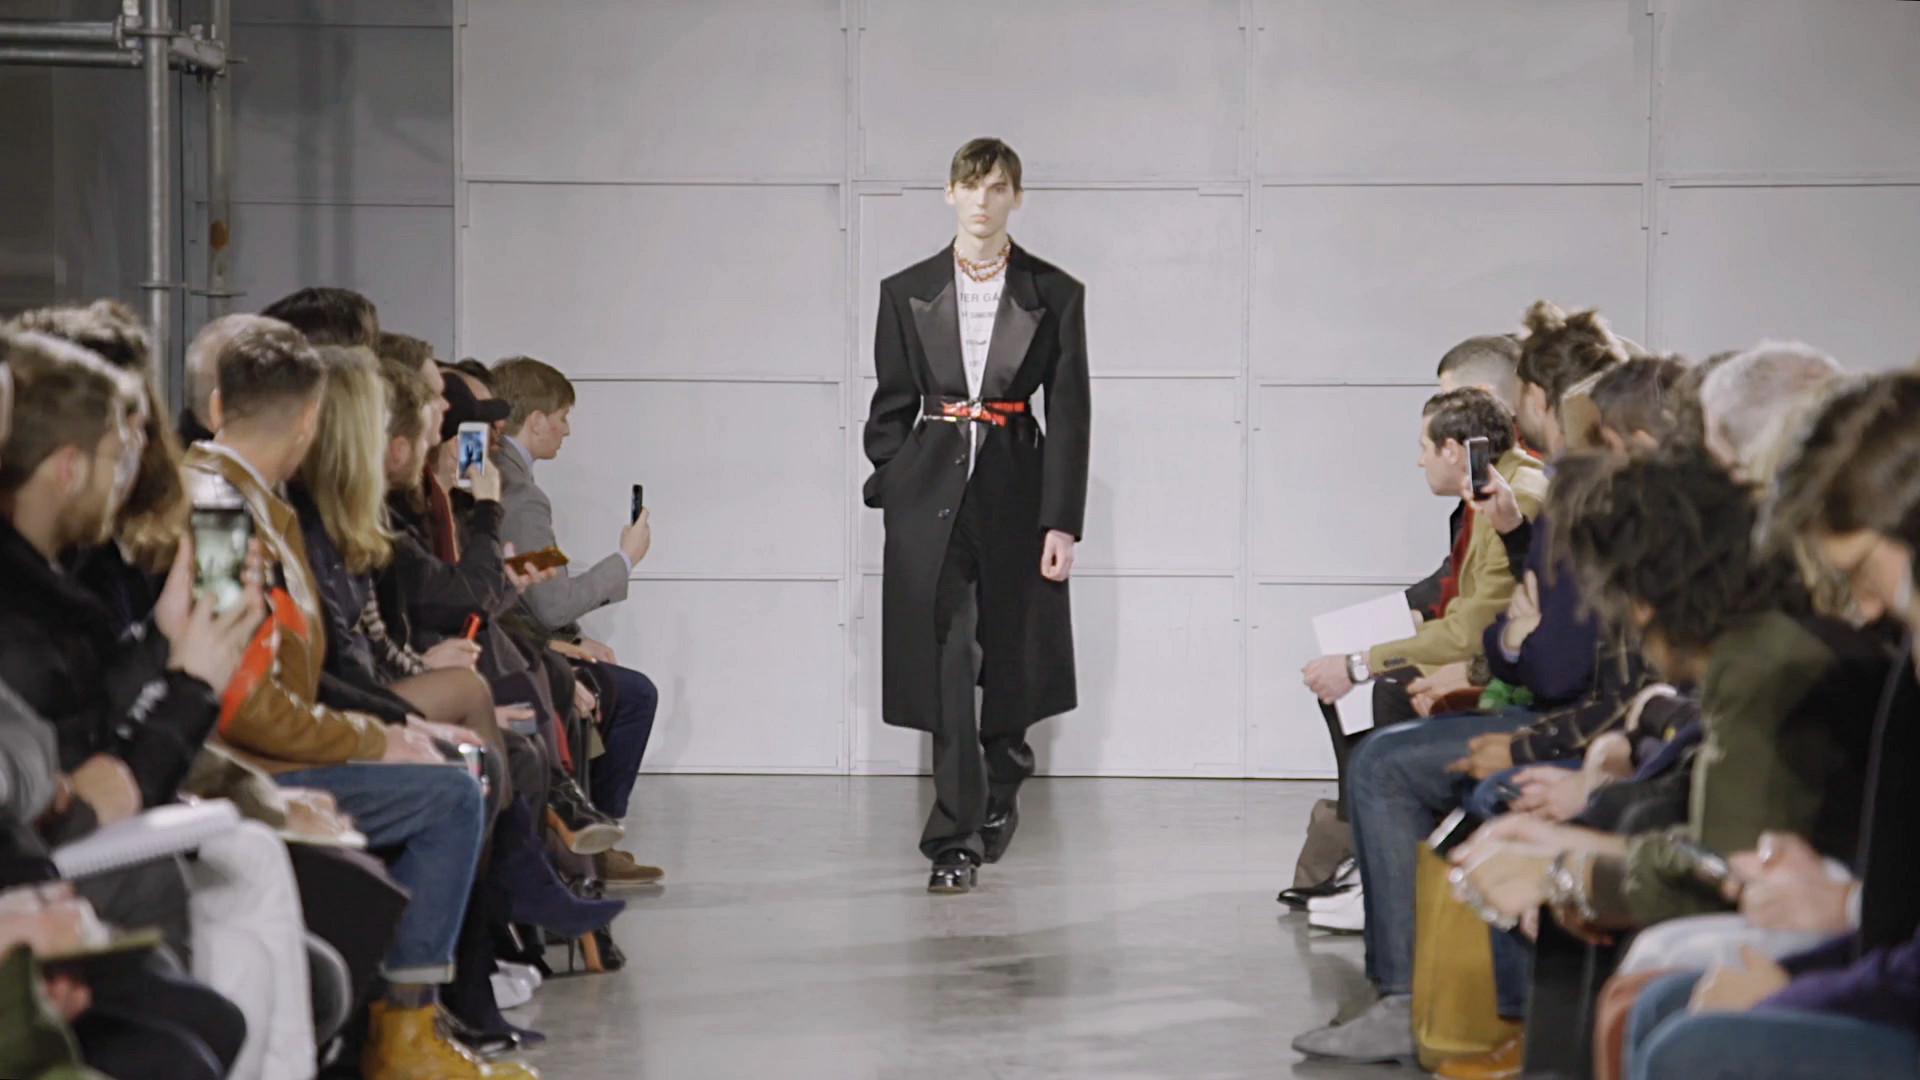 Raf Simons Fall Winter 2017-18 Fashion Show - New York Fashion Week